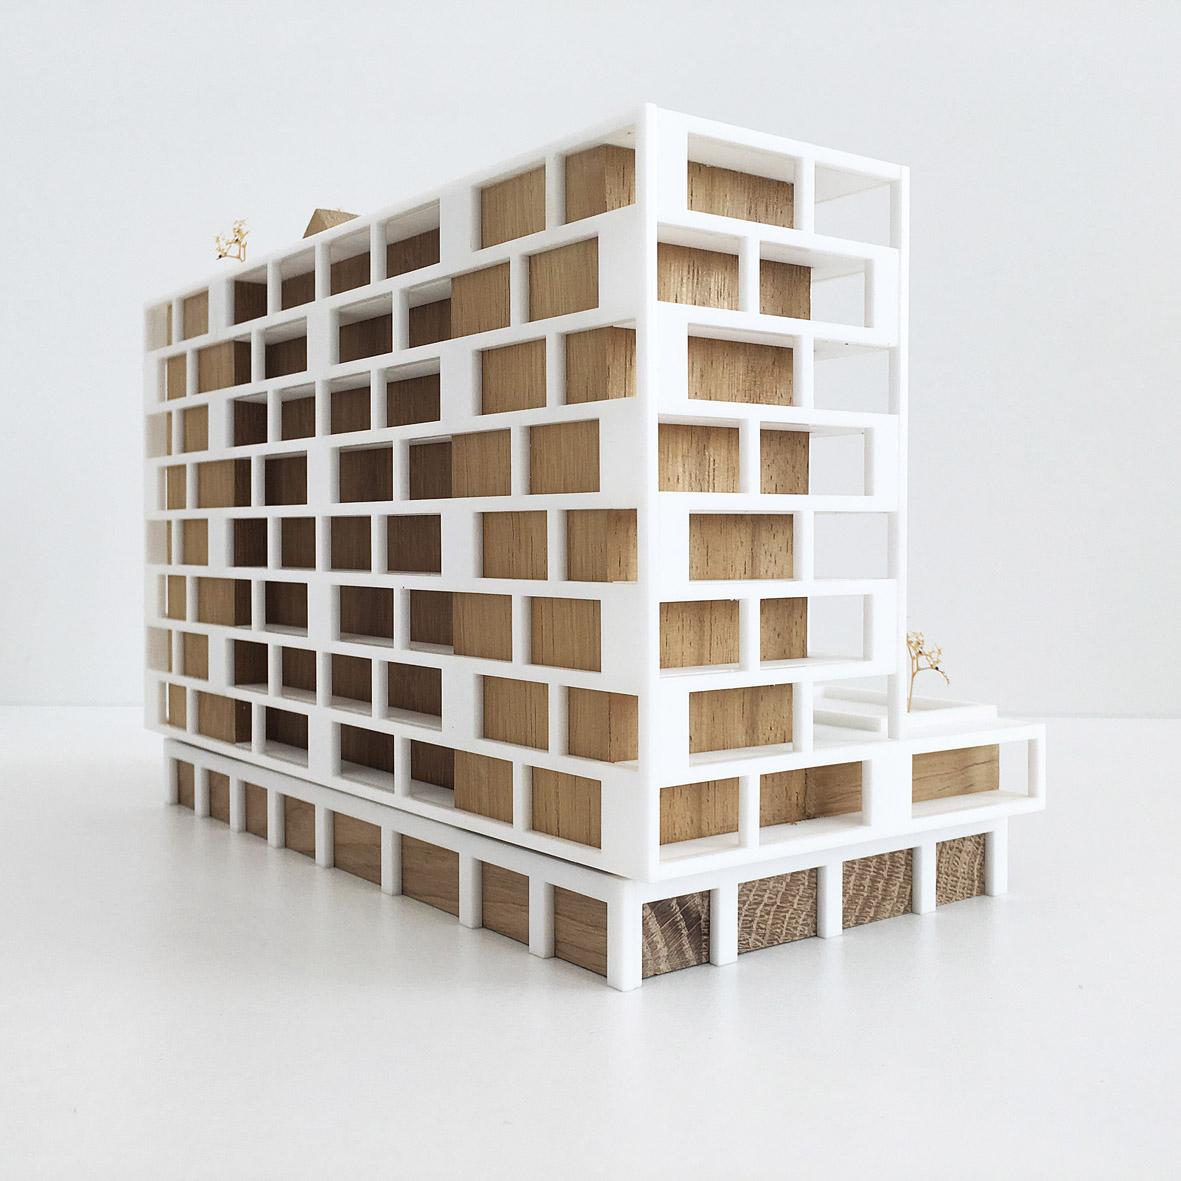 maquette BSH_IMG_5495 atelier PUUUR BSH zelfbouw cpo Amsterdam